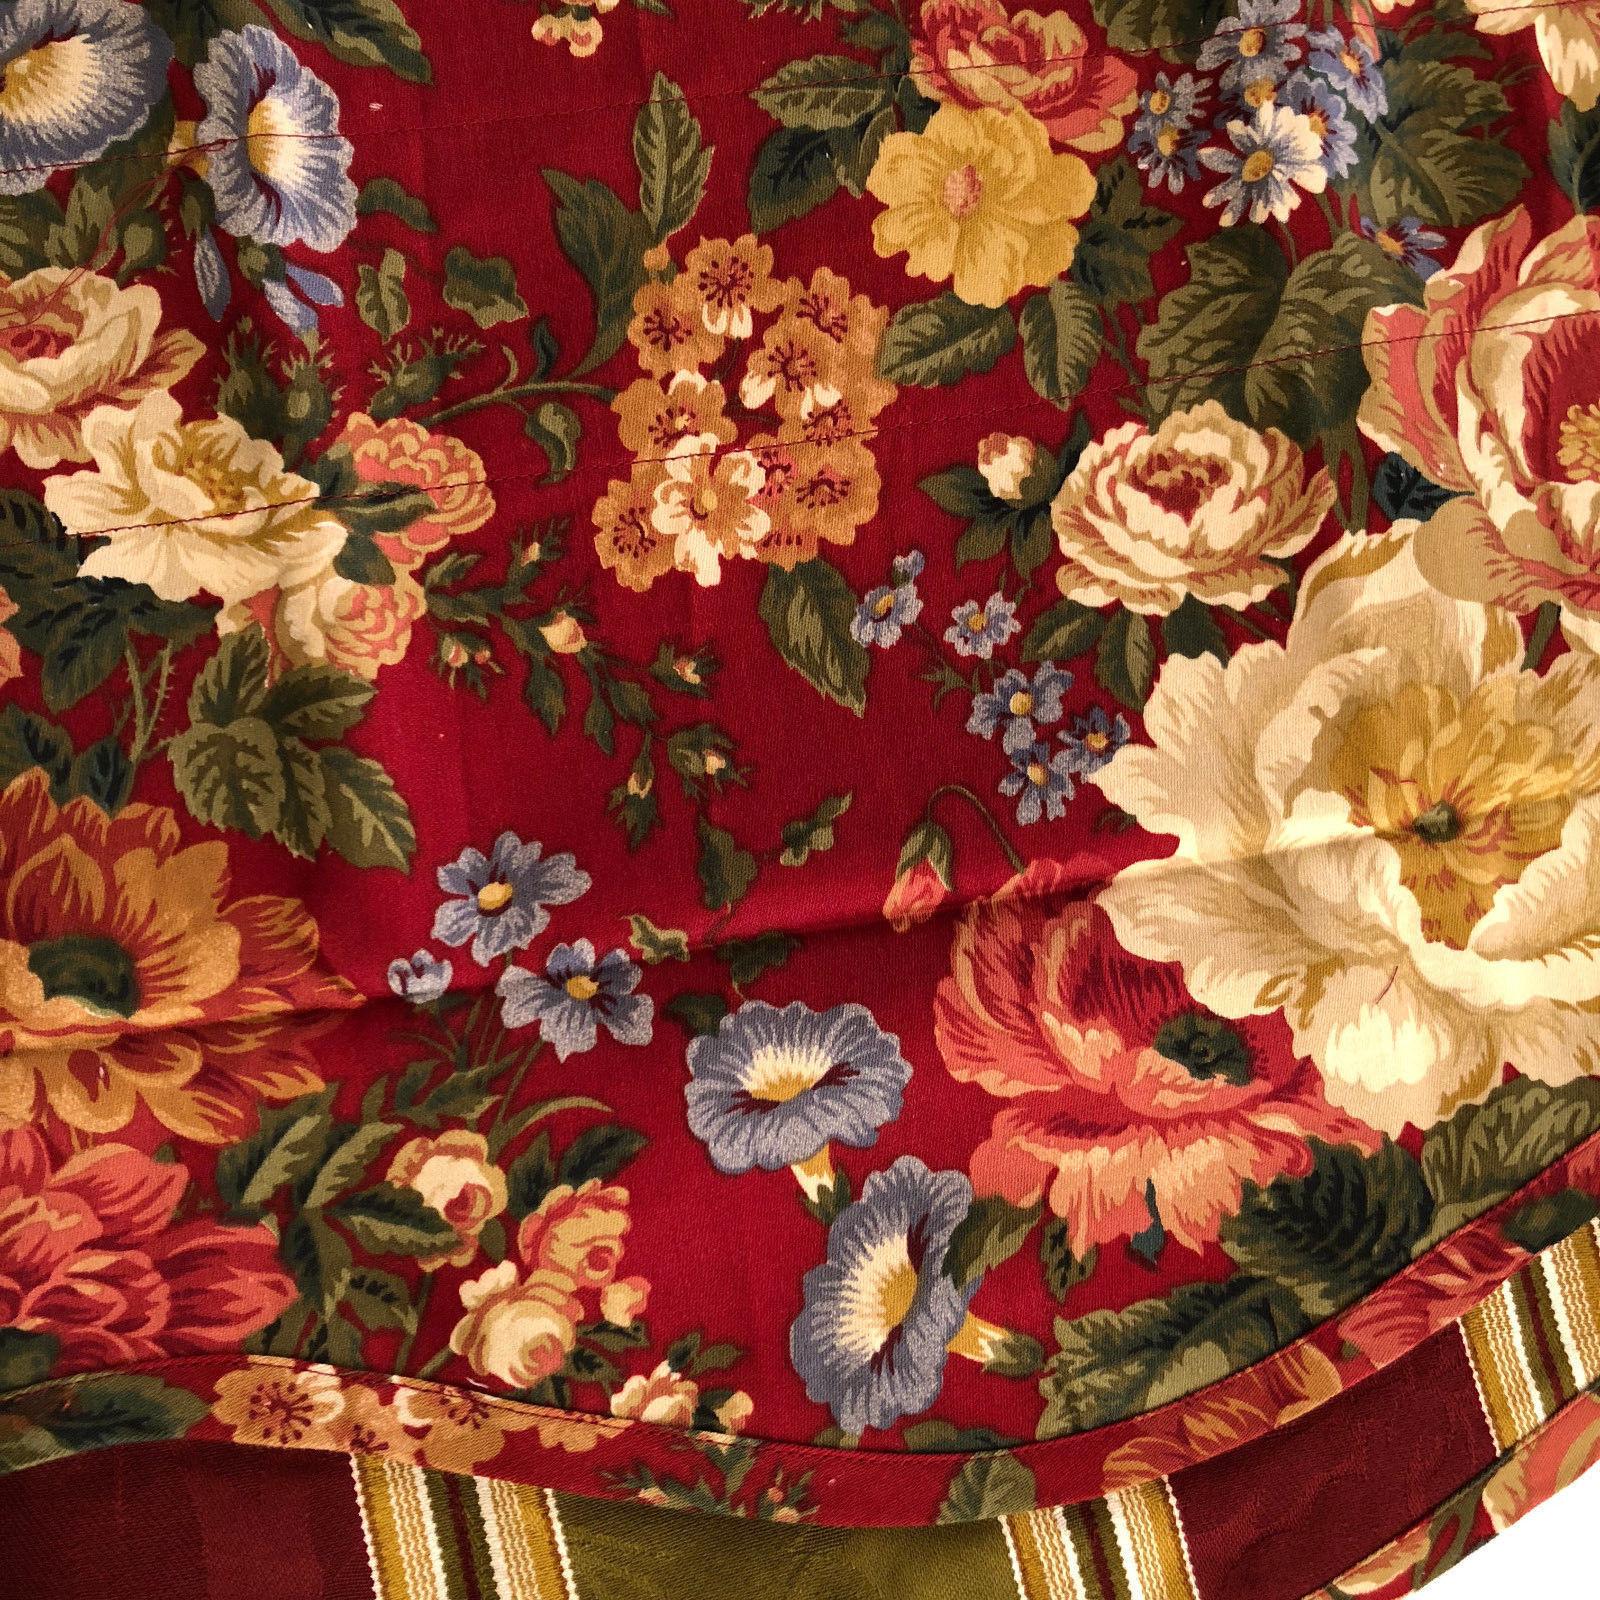 Waverly Valance Fairfield Cabernet Burgundy Villa Carlotta Floral Scallop 14x78